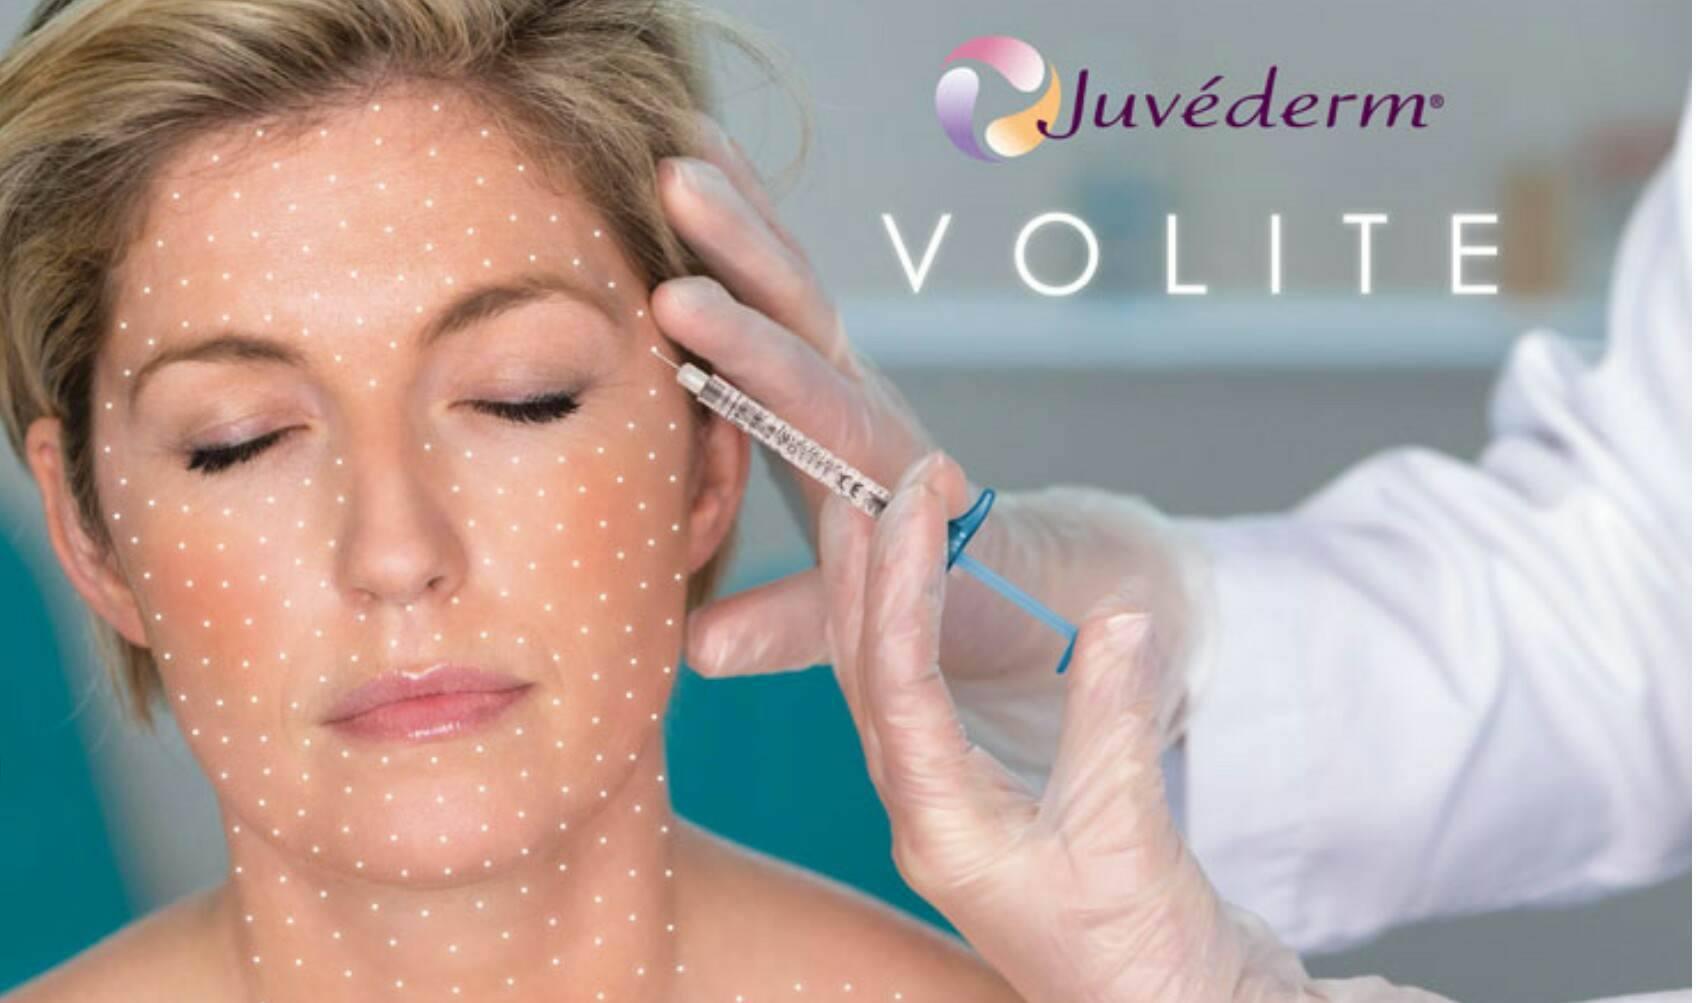 Riduri fine, cicatrici post acnee, sau piele deshidratata lipsita de vitalitate si elasticitate?